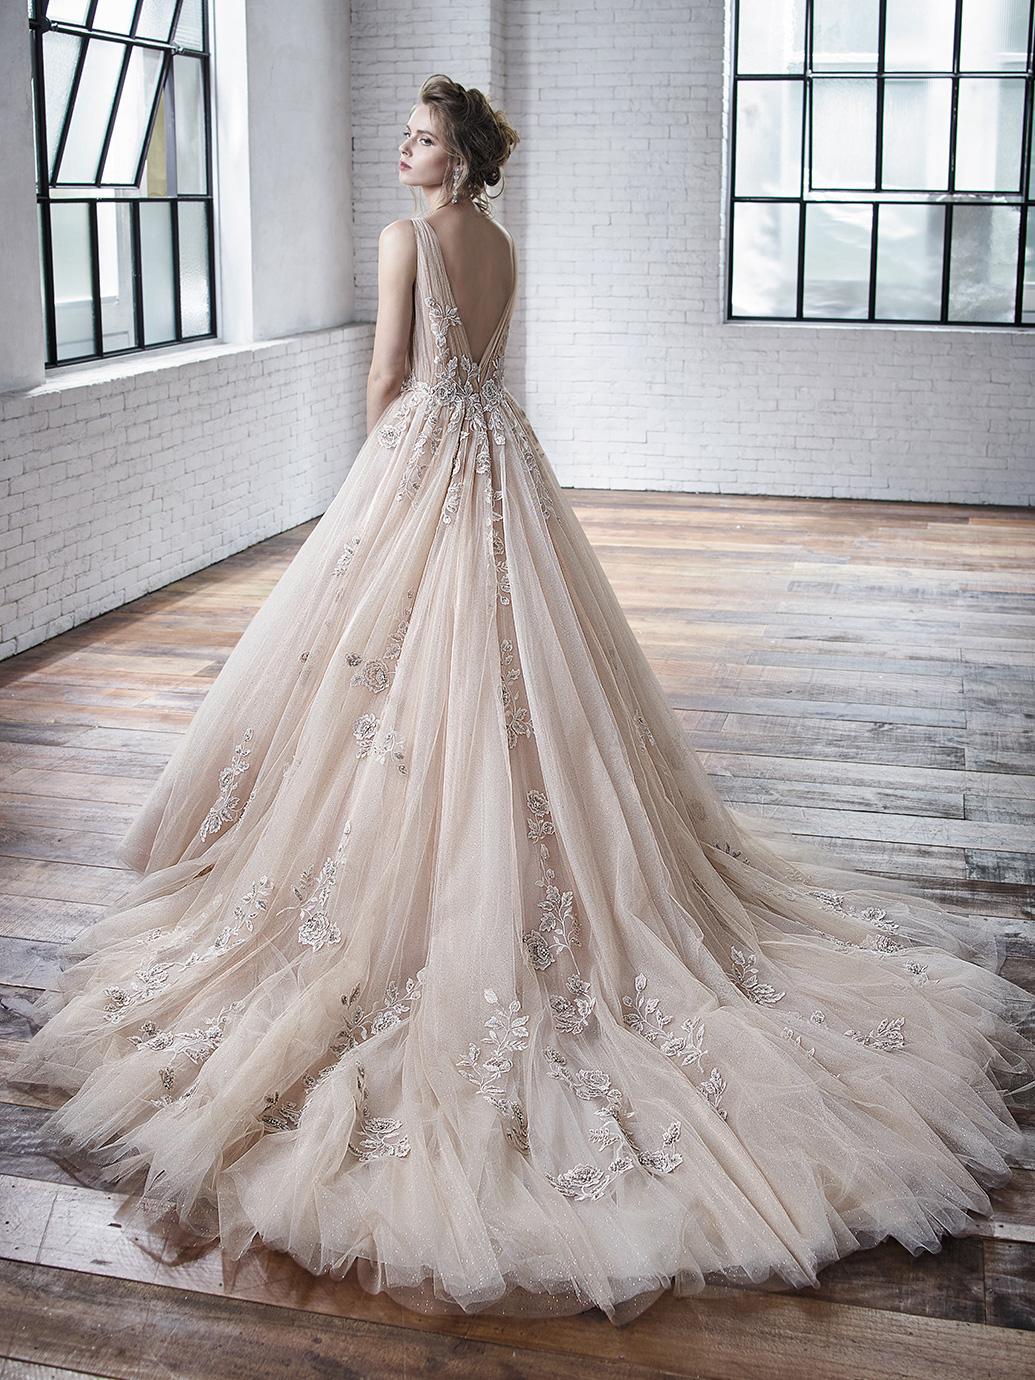 BM_Bride_2019_Pro_Cheryl_Bac_Web.jpg